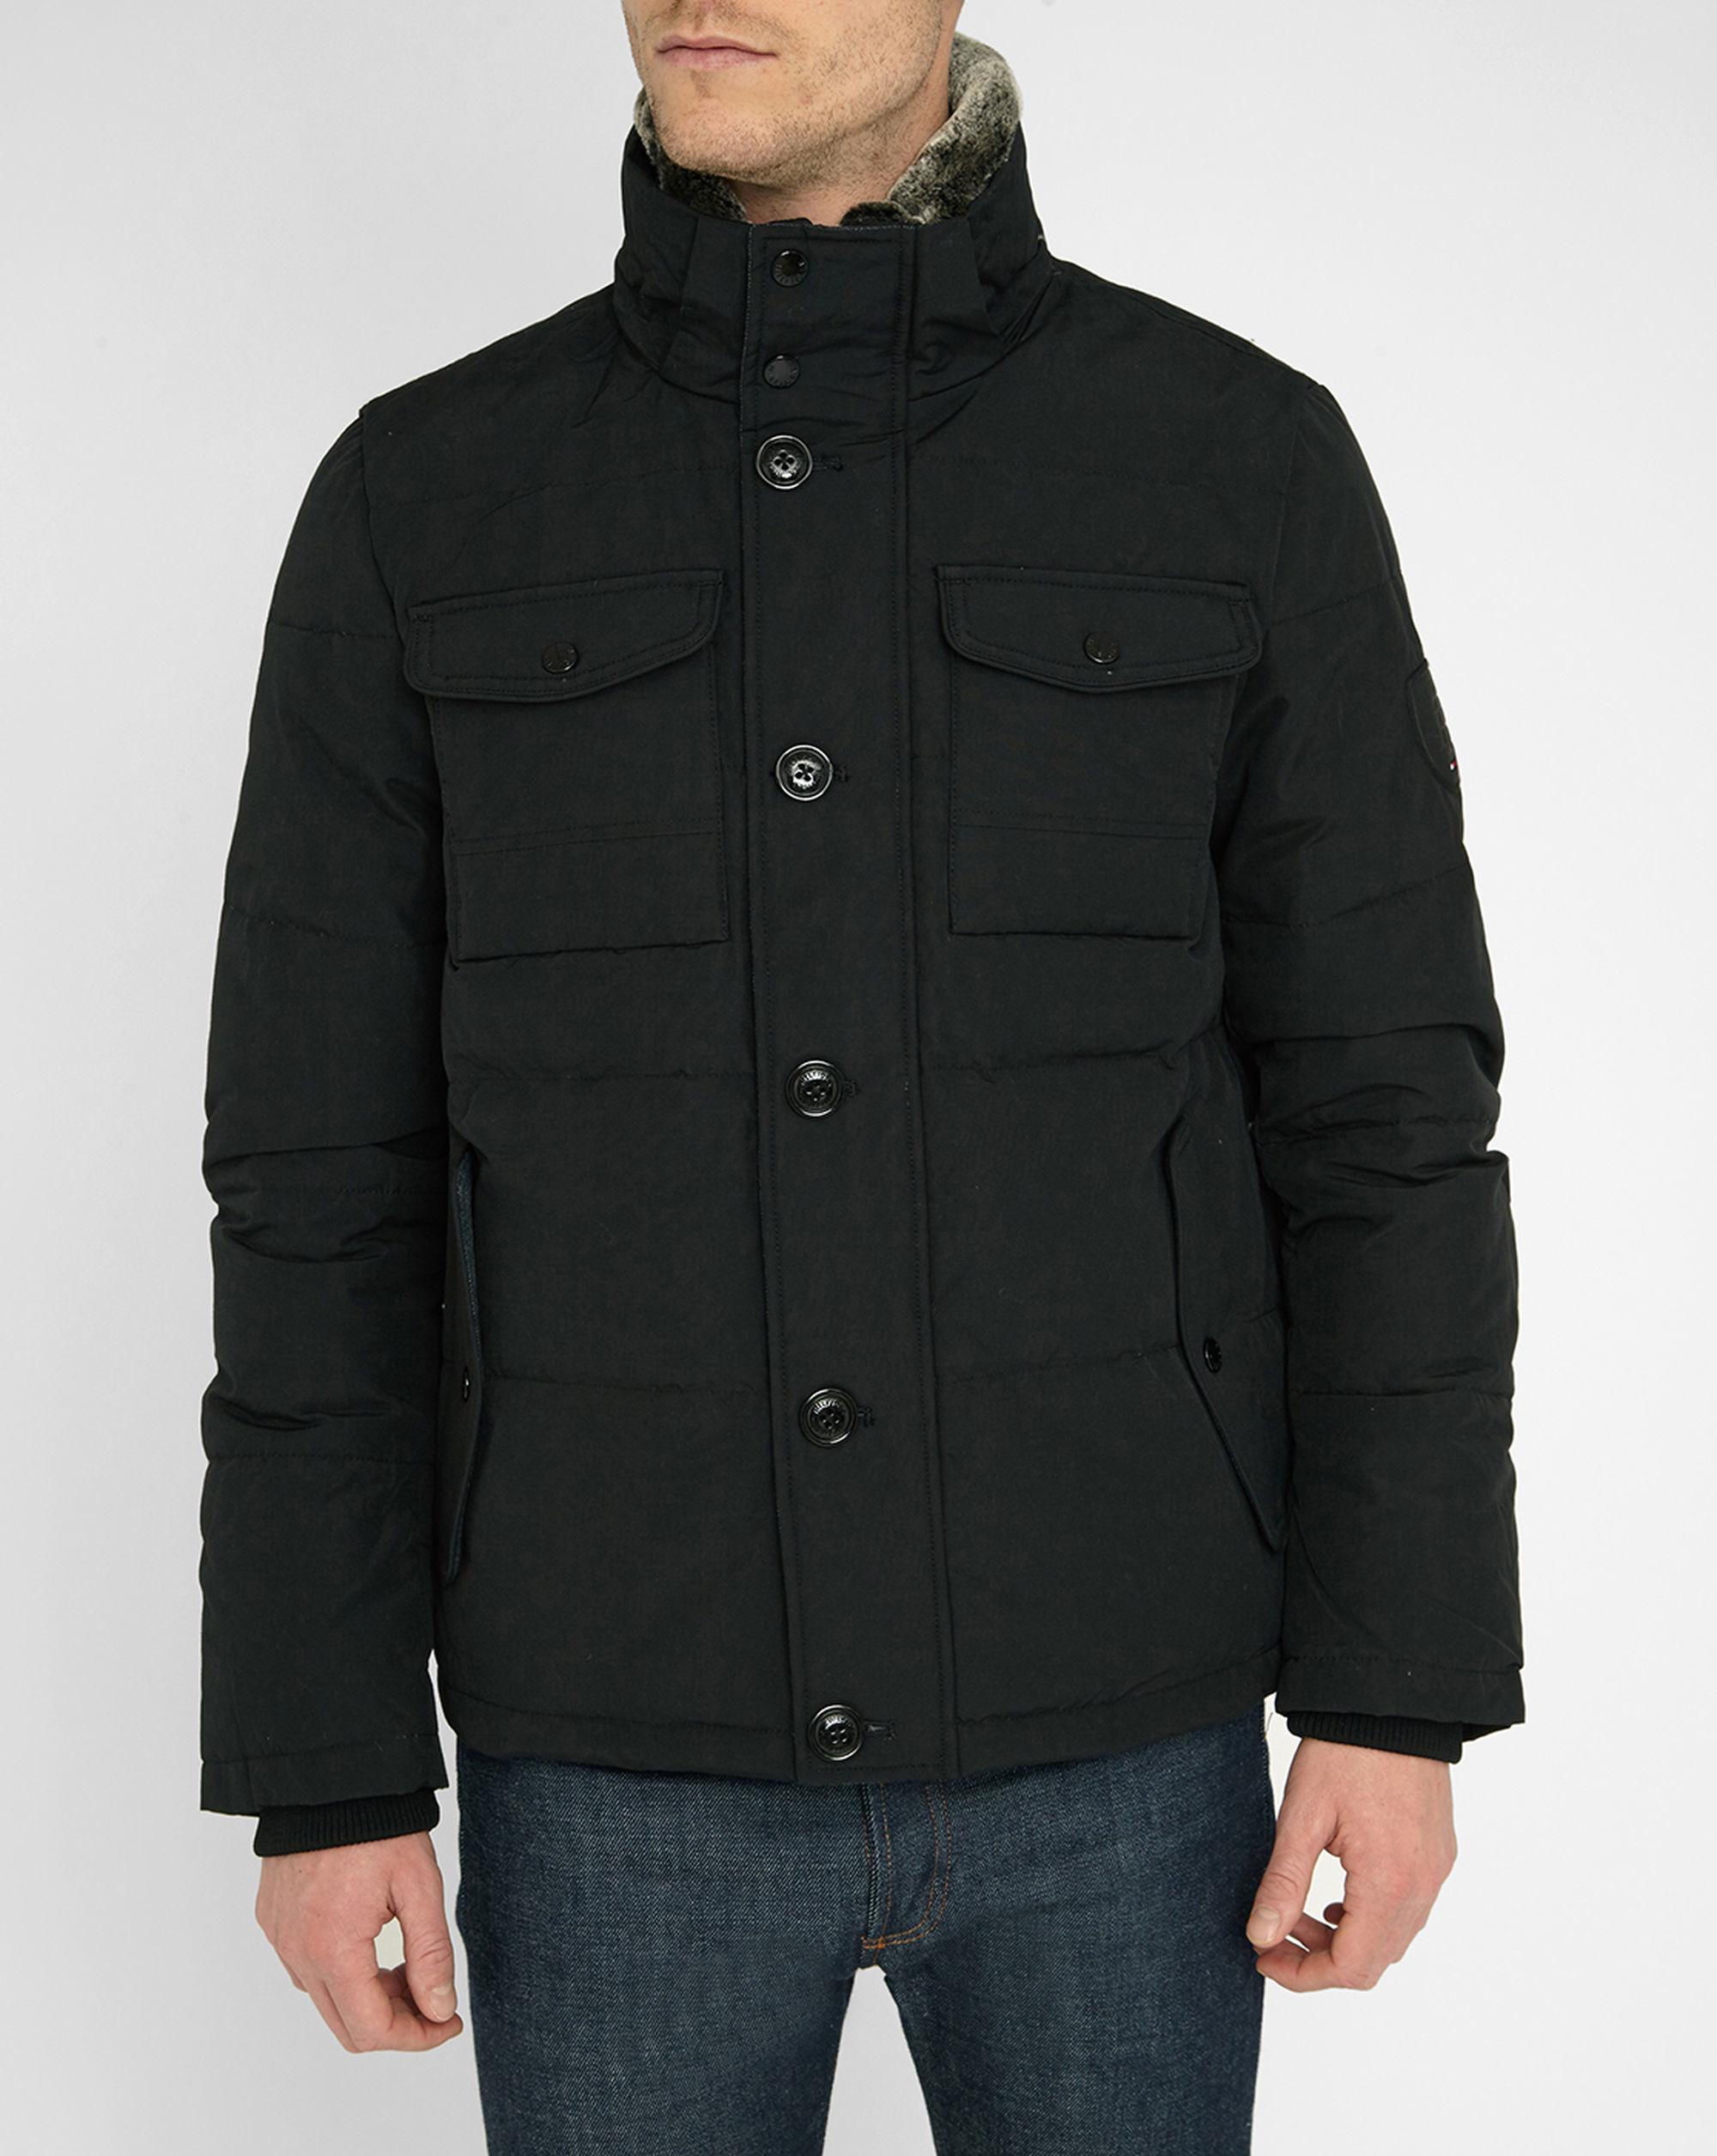 1f3337813 Tommy Hilfiger Winter Coat. tommy hilfiger solid royal blue puffer ...